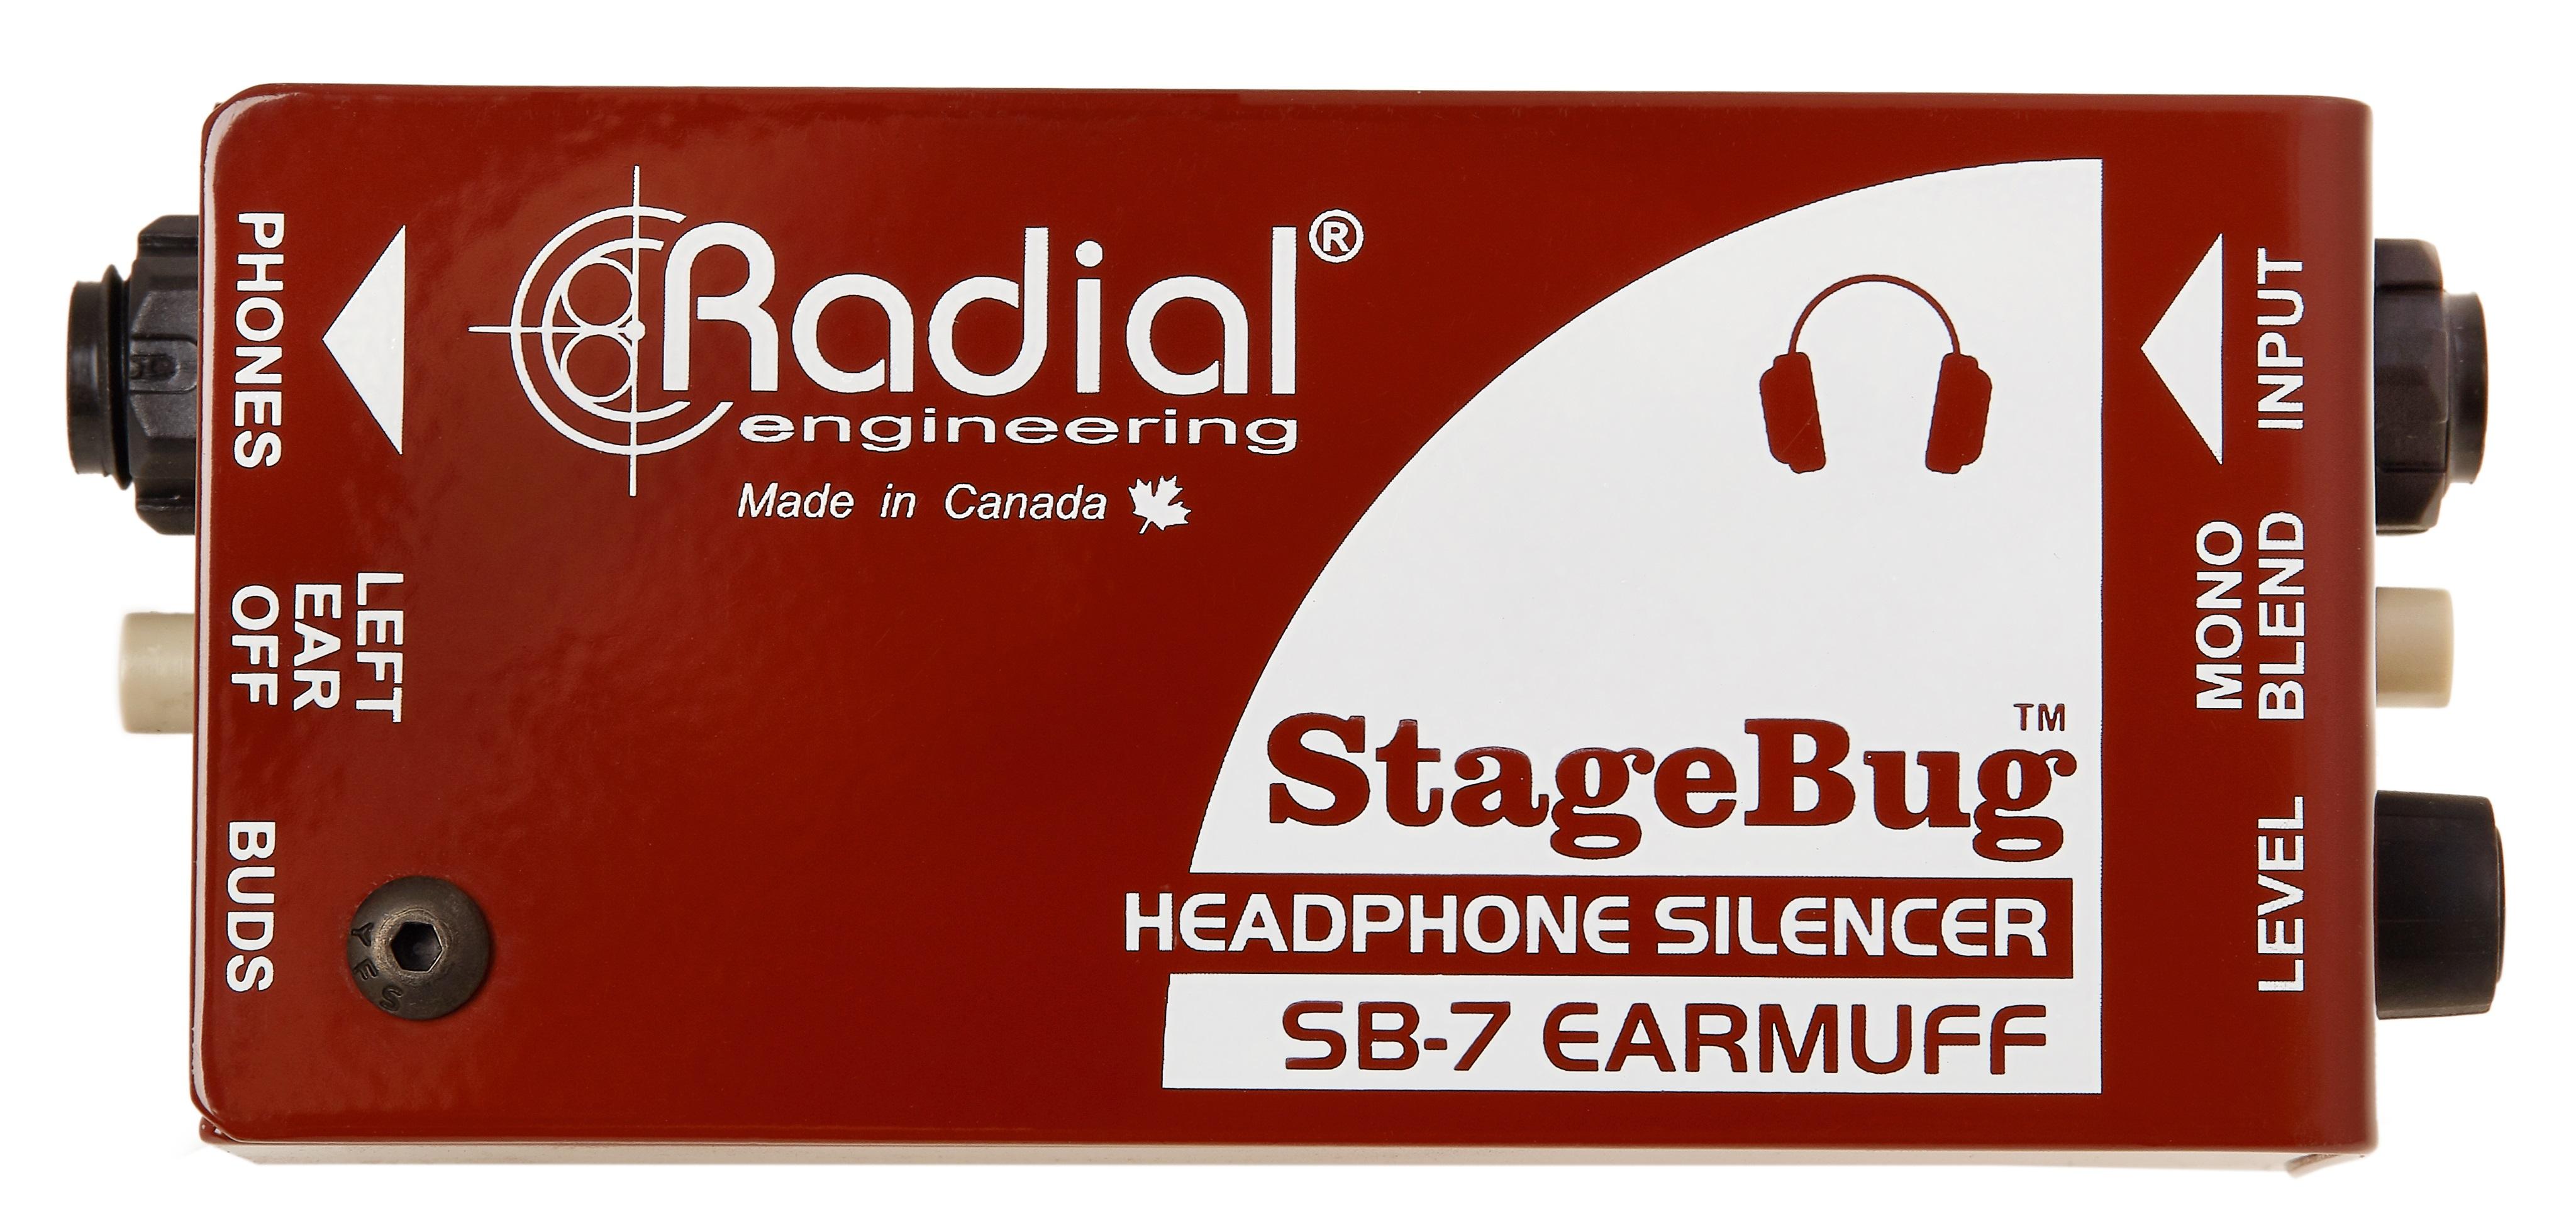 Radial Engineering StageBug SB-7 Ear Muff